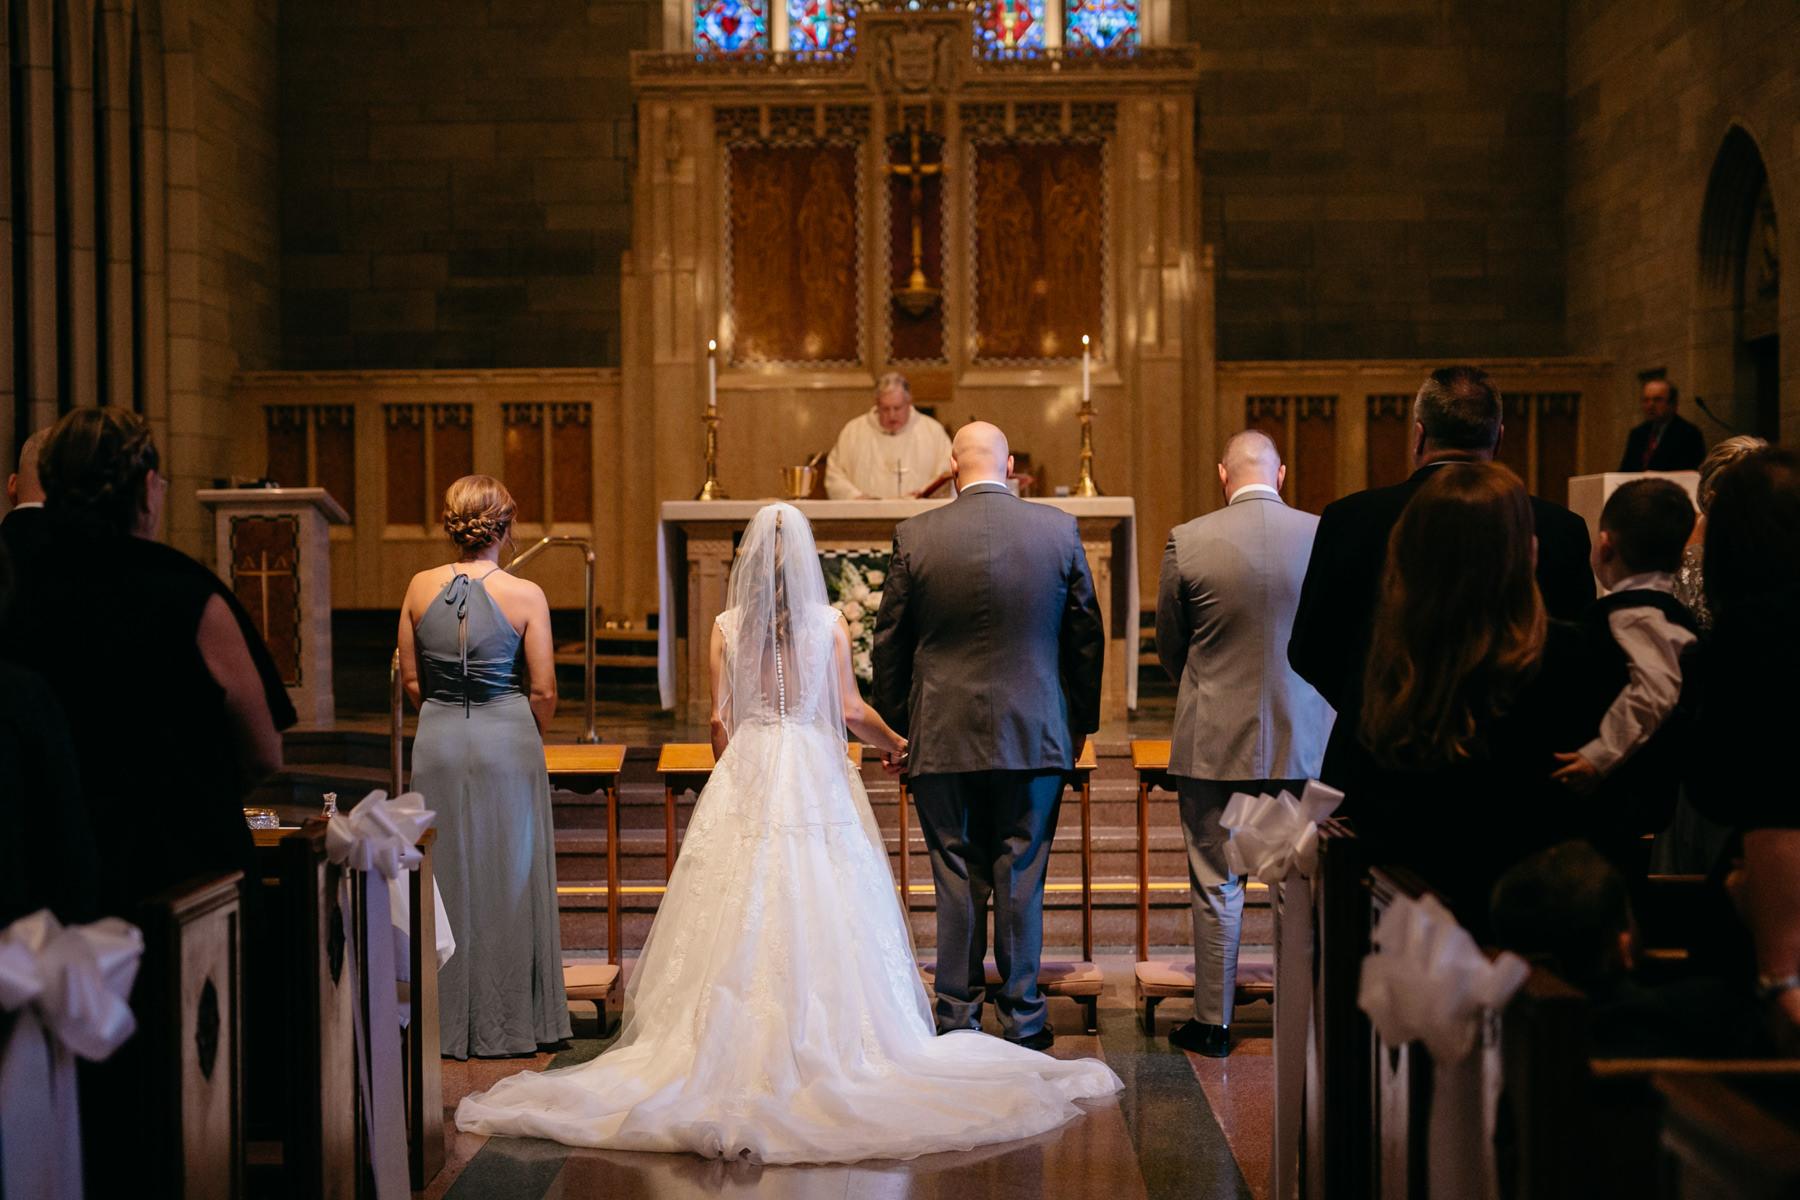 Quincy Ma Massachusetts Wedding Dedham Boston Granie Links Wedding New England Catholic Cathedral Liz Osban Photography 51.jpg